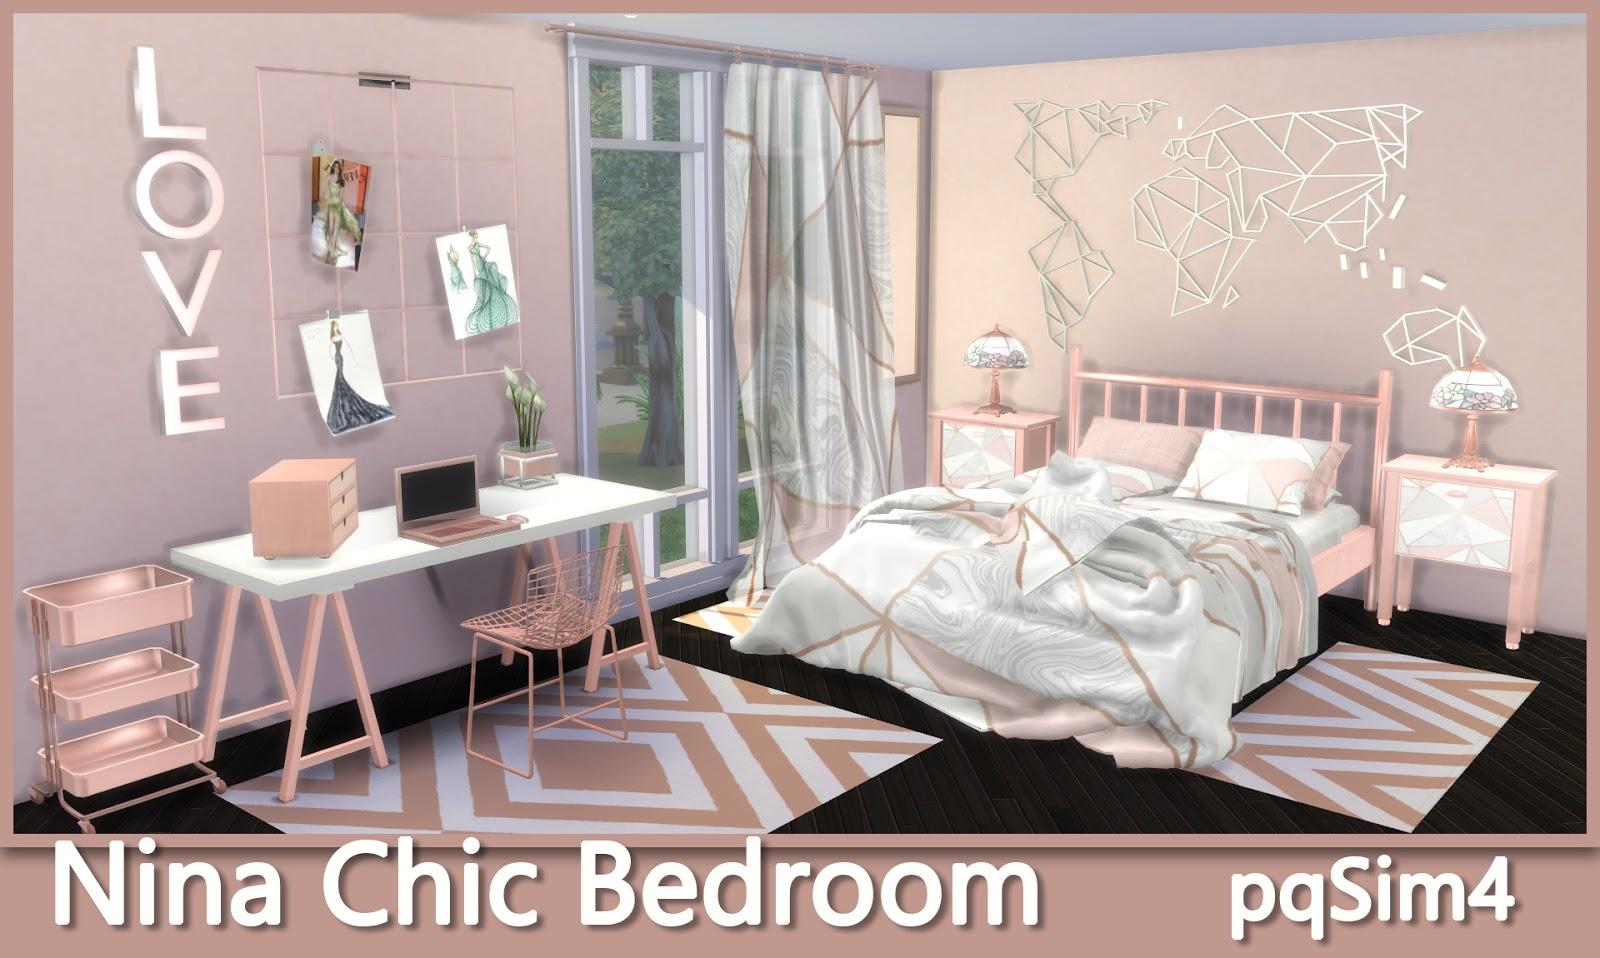 Nina Chic Bedroom. Sims 4 Custom Content.